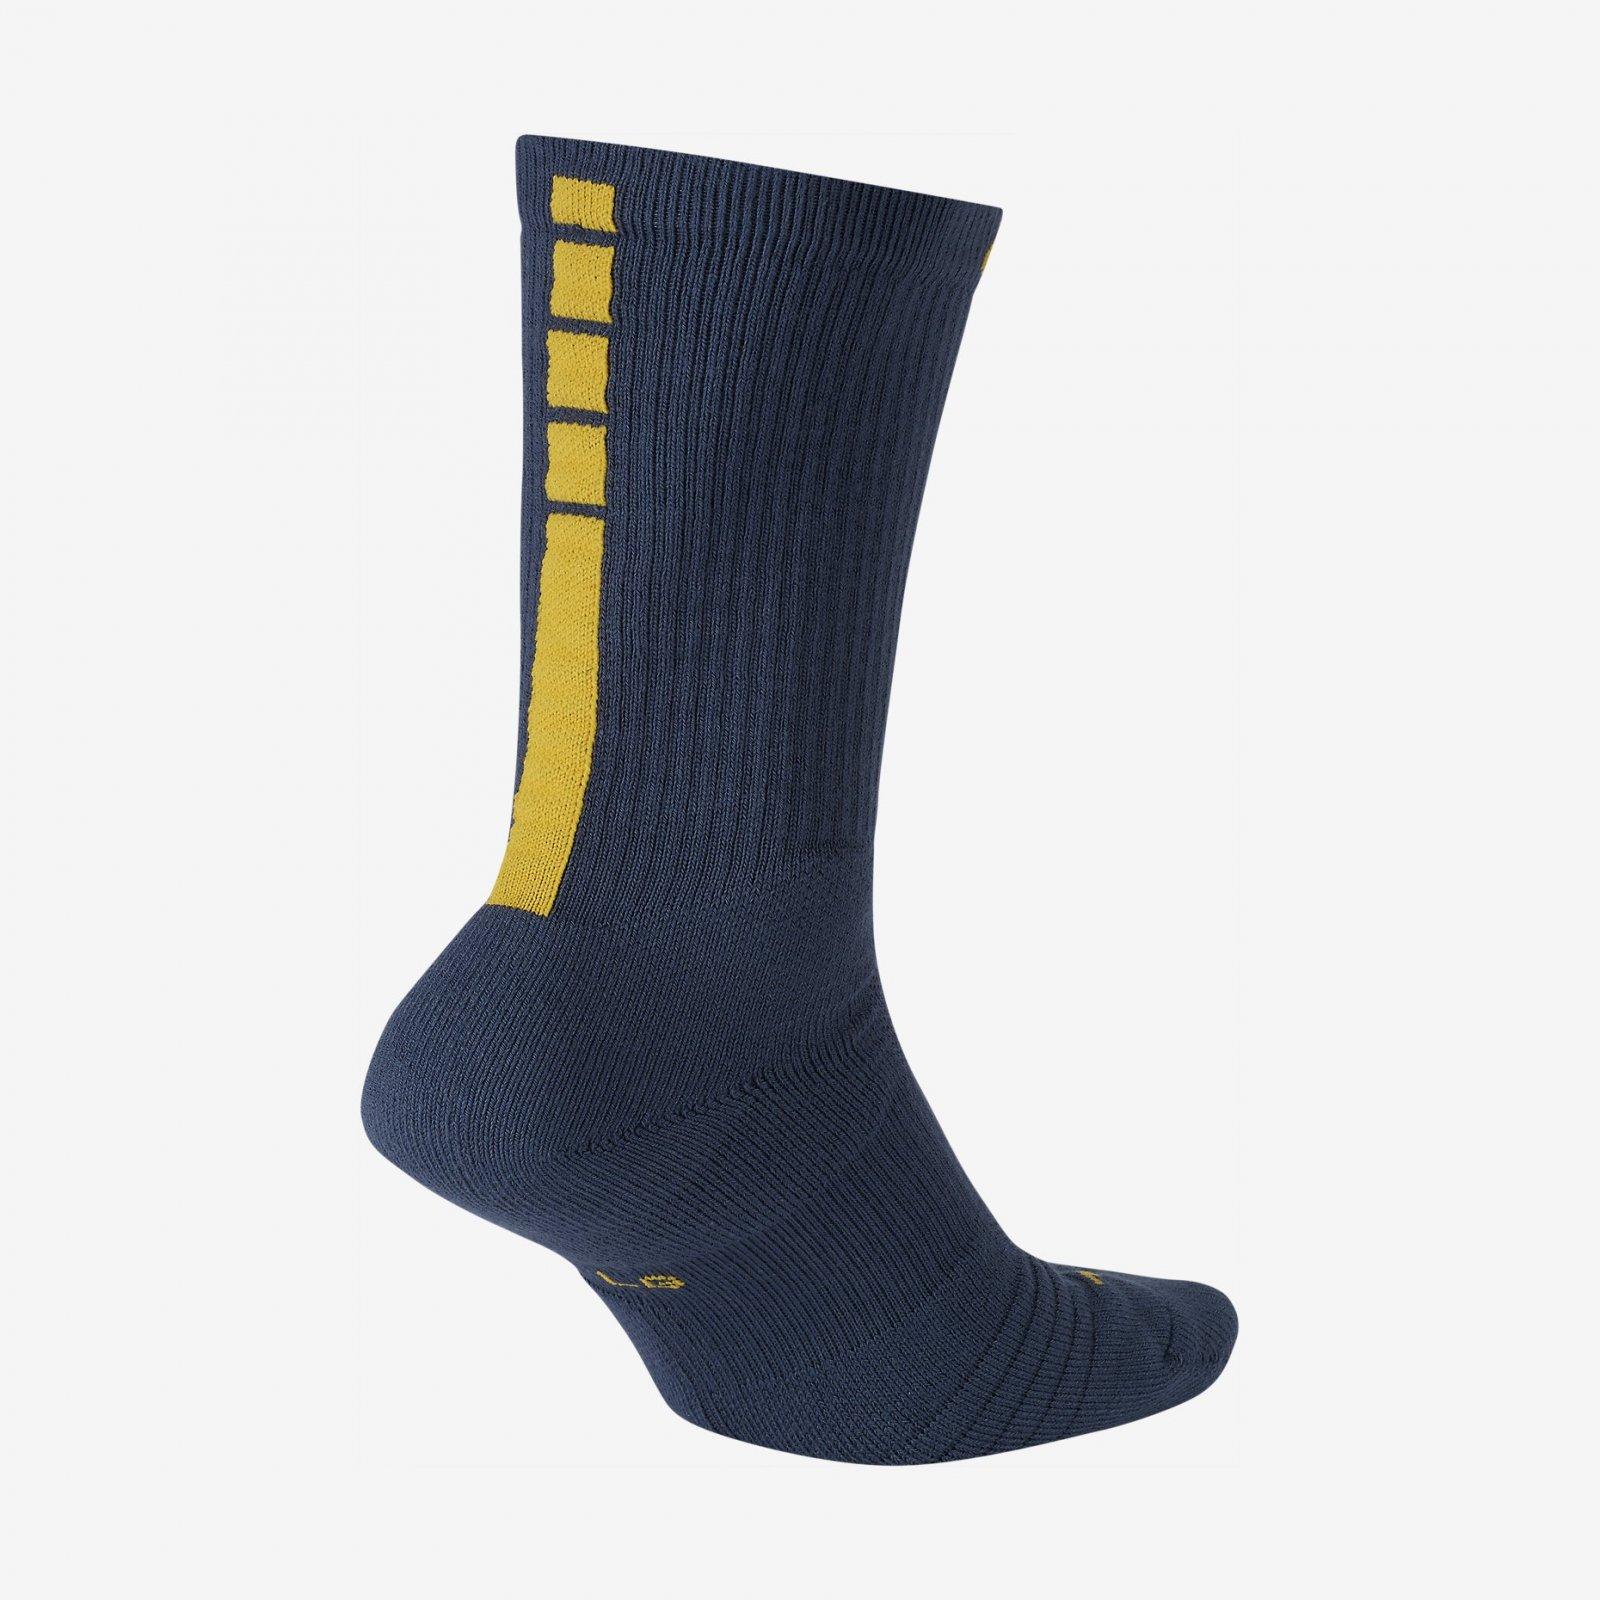 1bdec1eb489d NBA Nike Elite City Edition Crew Golden State Warriors GSW Socks  SX5981-471. Nike